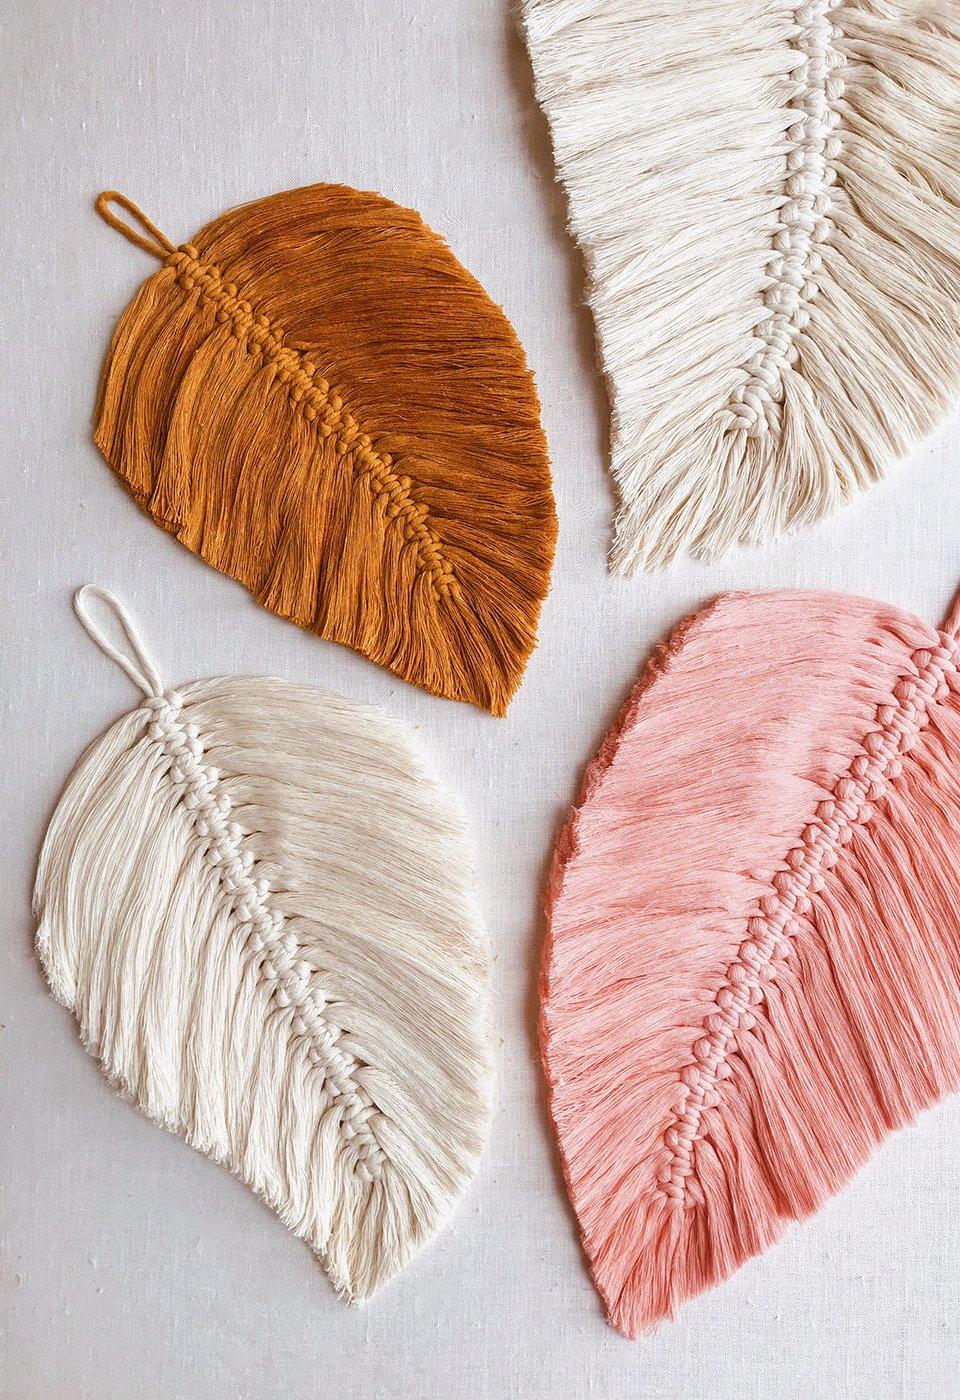 Diy Macrame Feathers Honestly Wtf